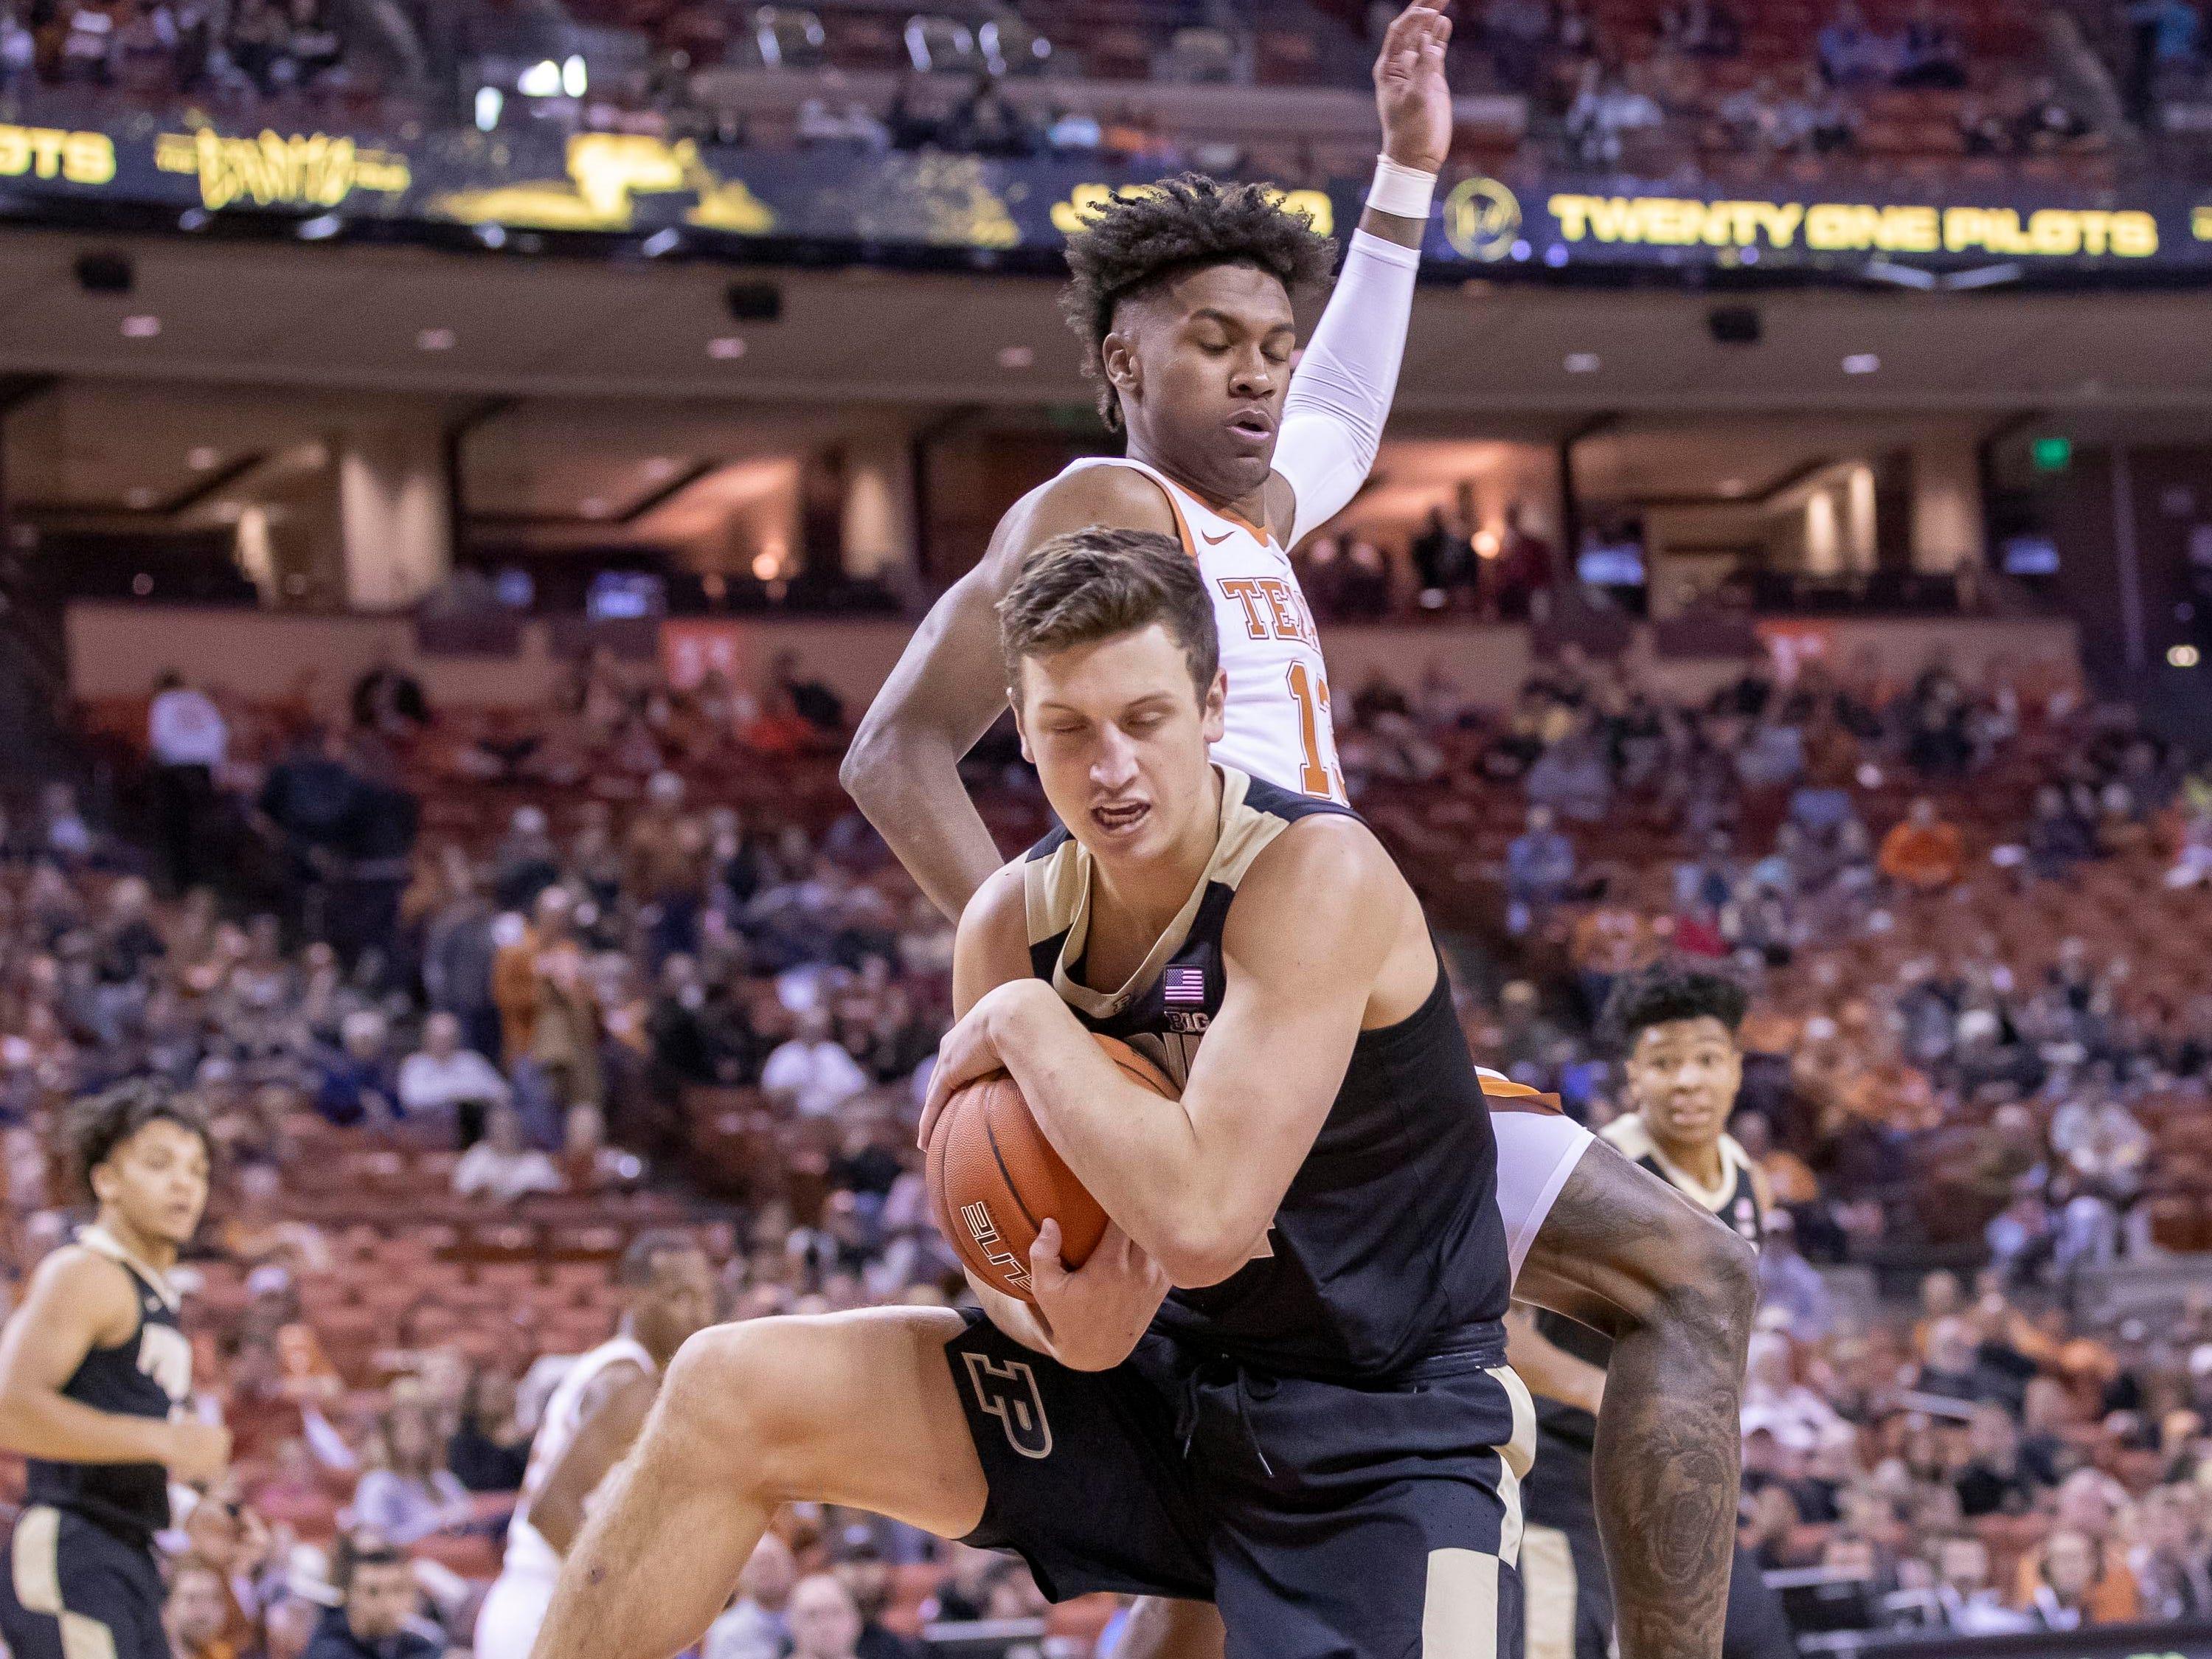 Purdue forward Grady Eifert (24) rebounds the ball against Texas at Frank Erwin Center on Sunday, Dec. 9.